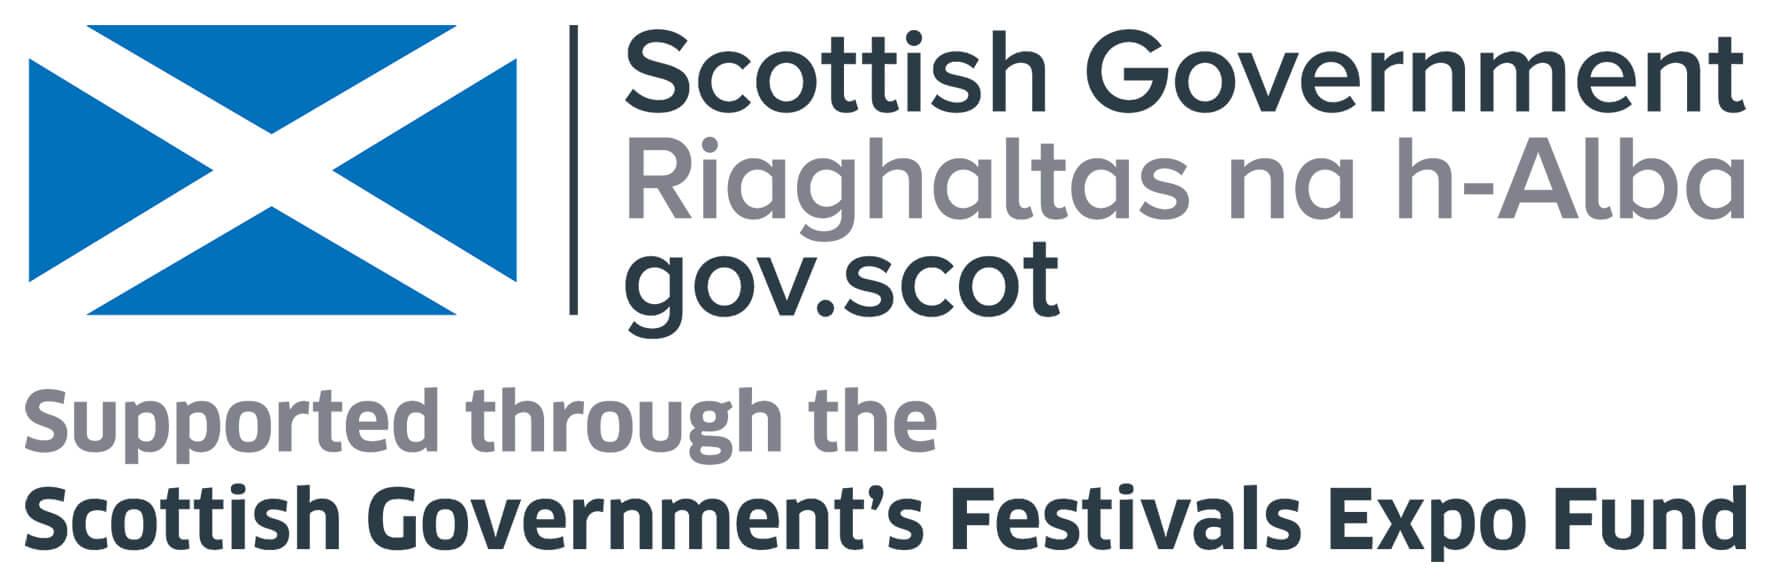 Scottish Government's Festivals Expo Fund logo